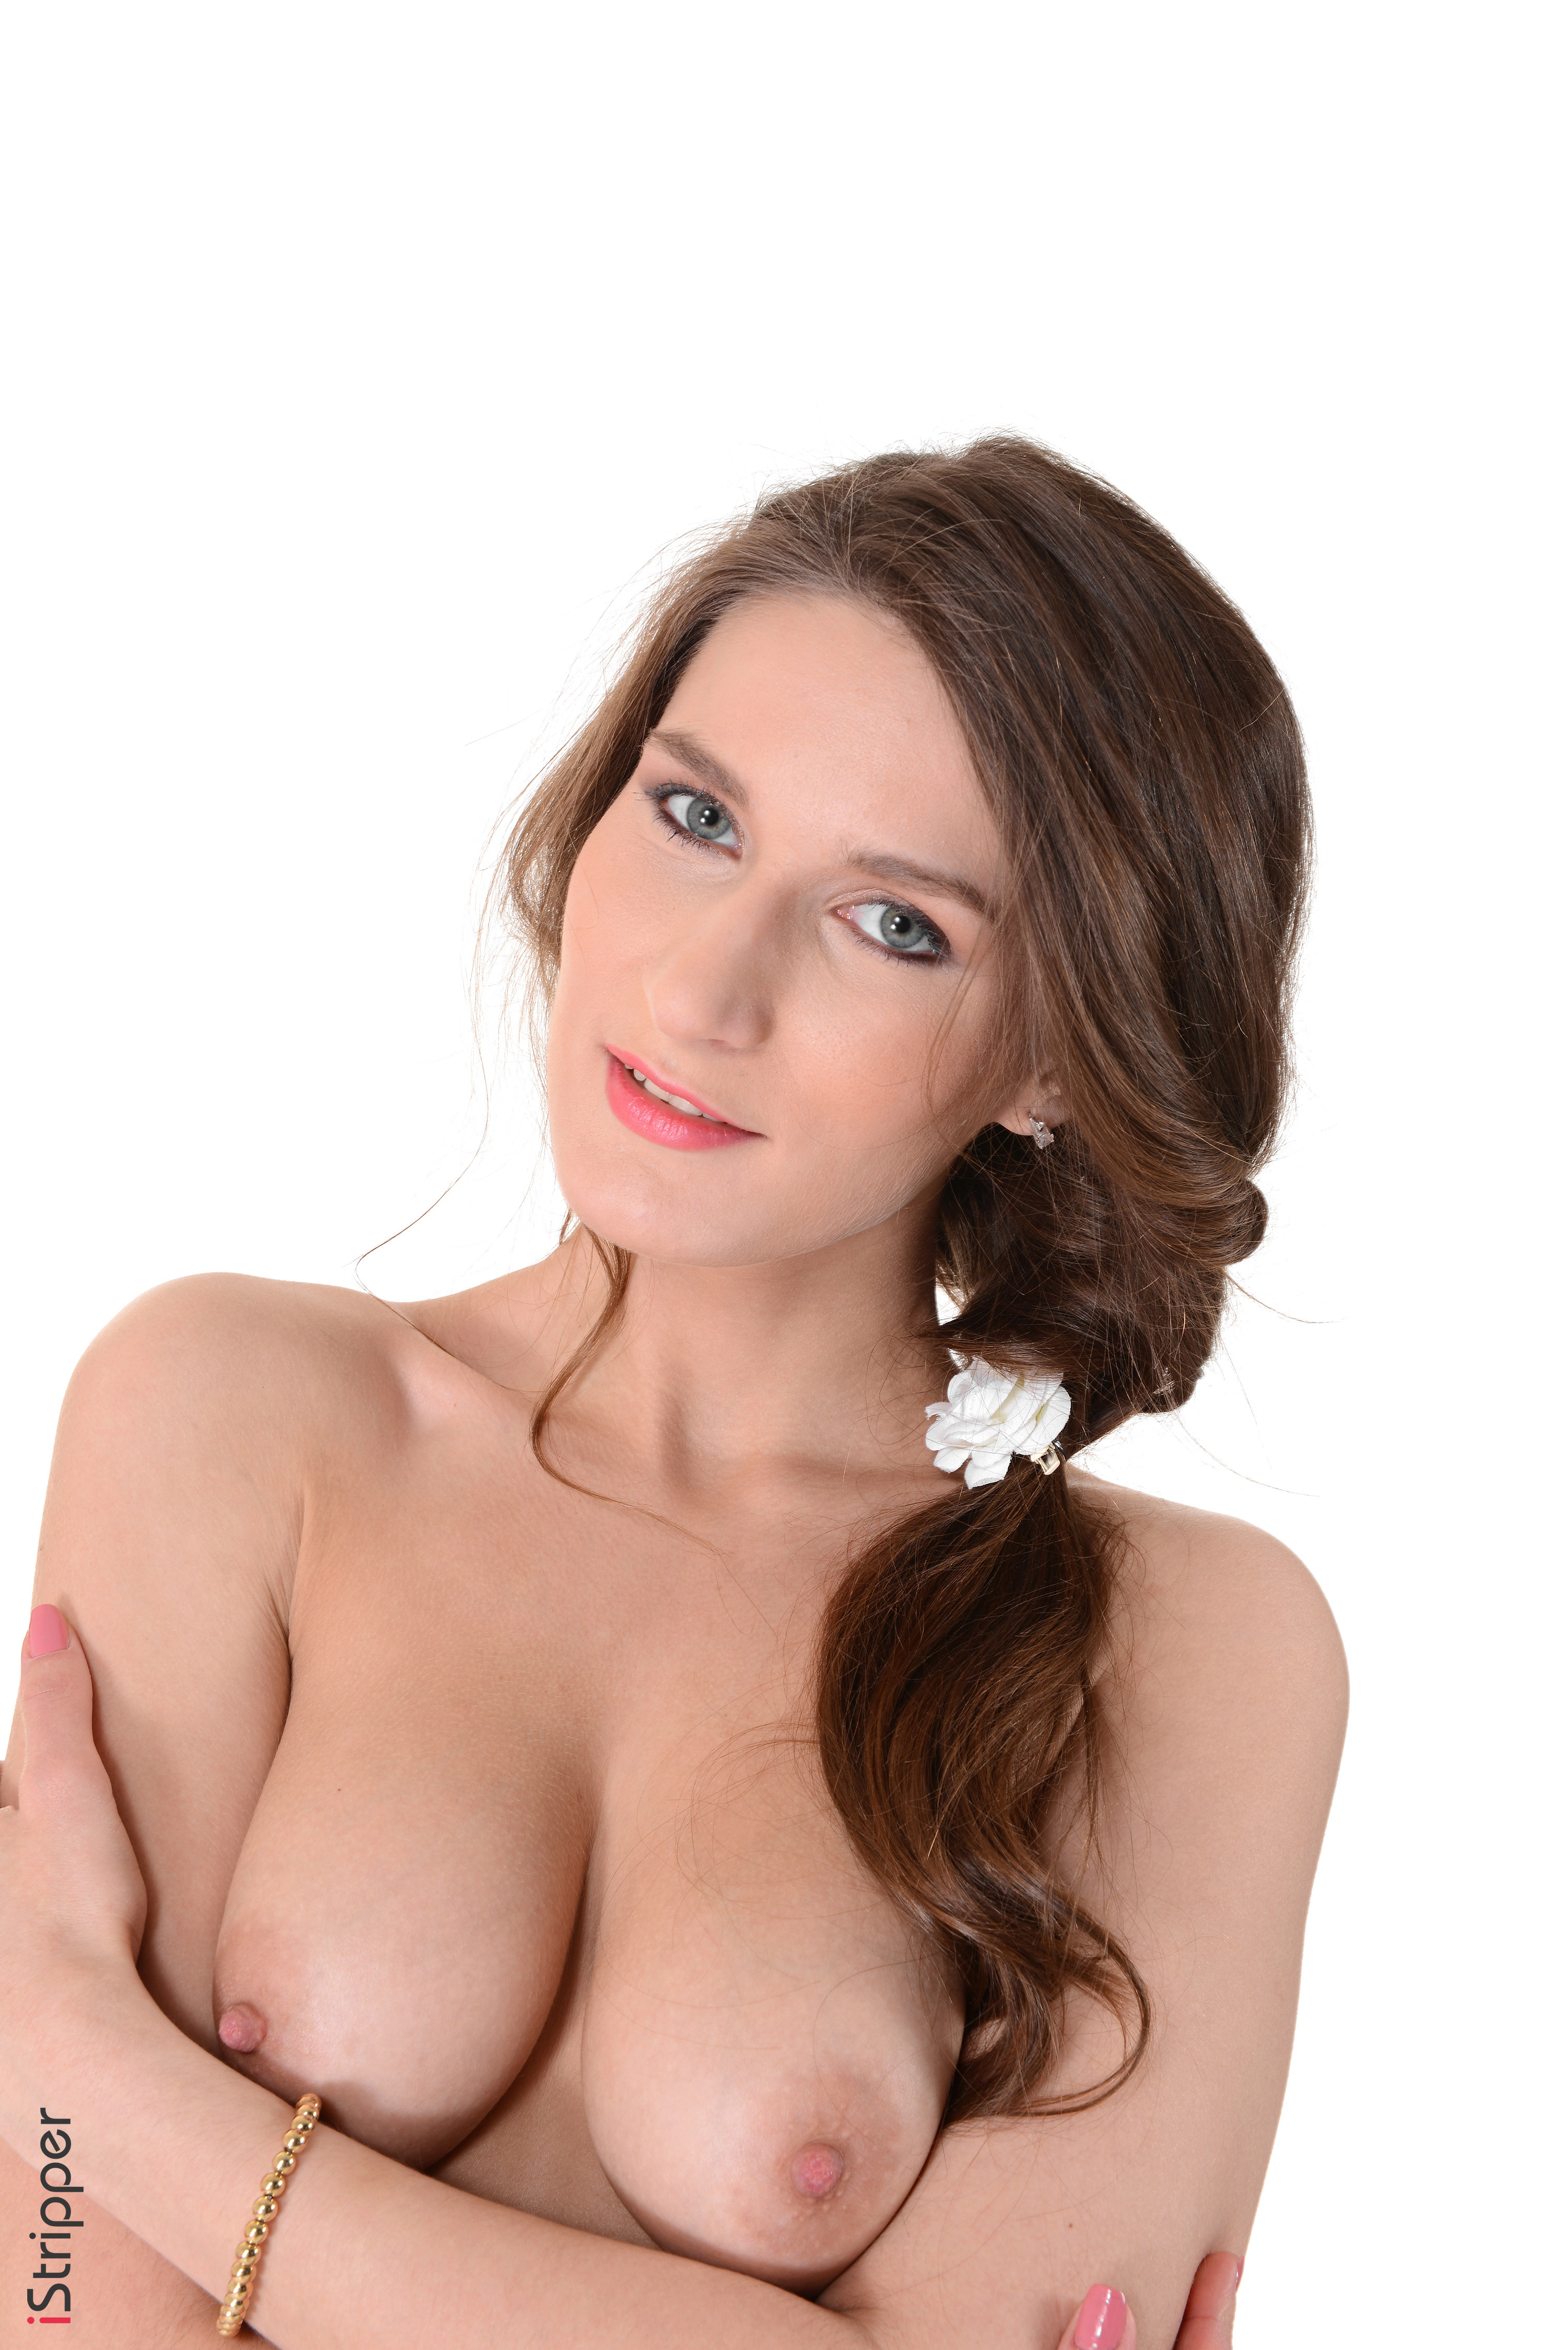 nued wallpaper